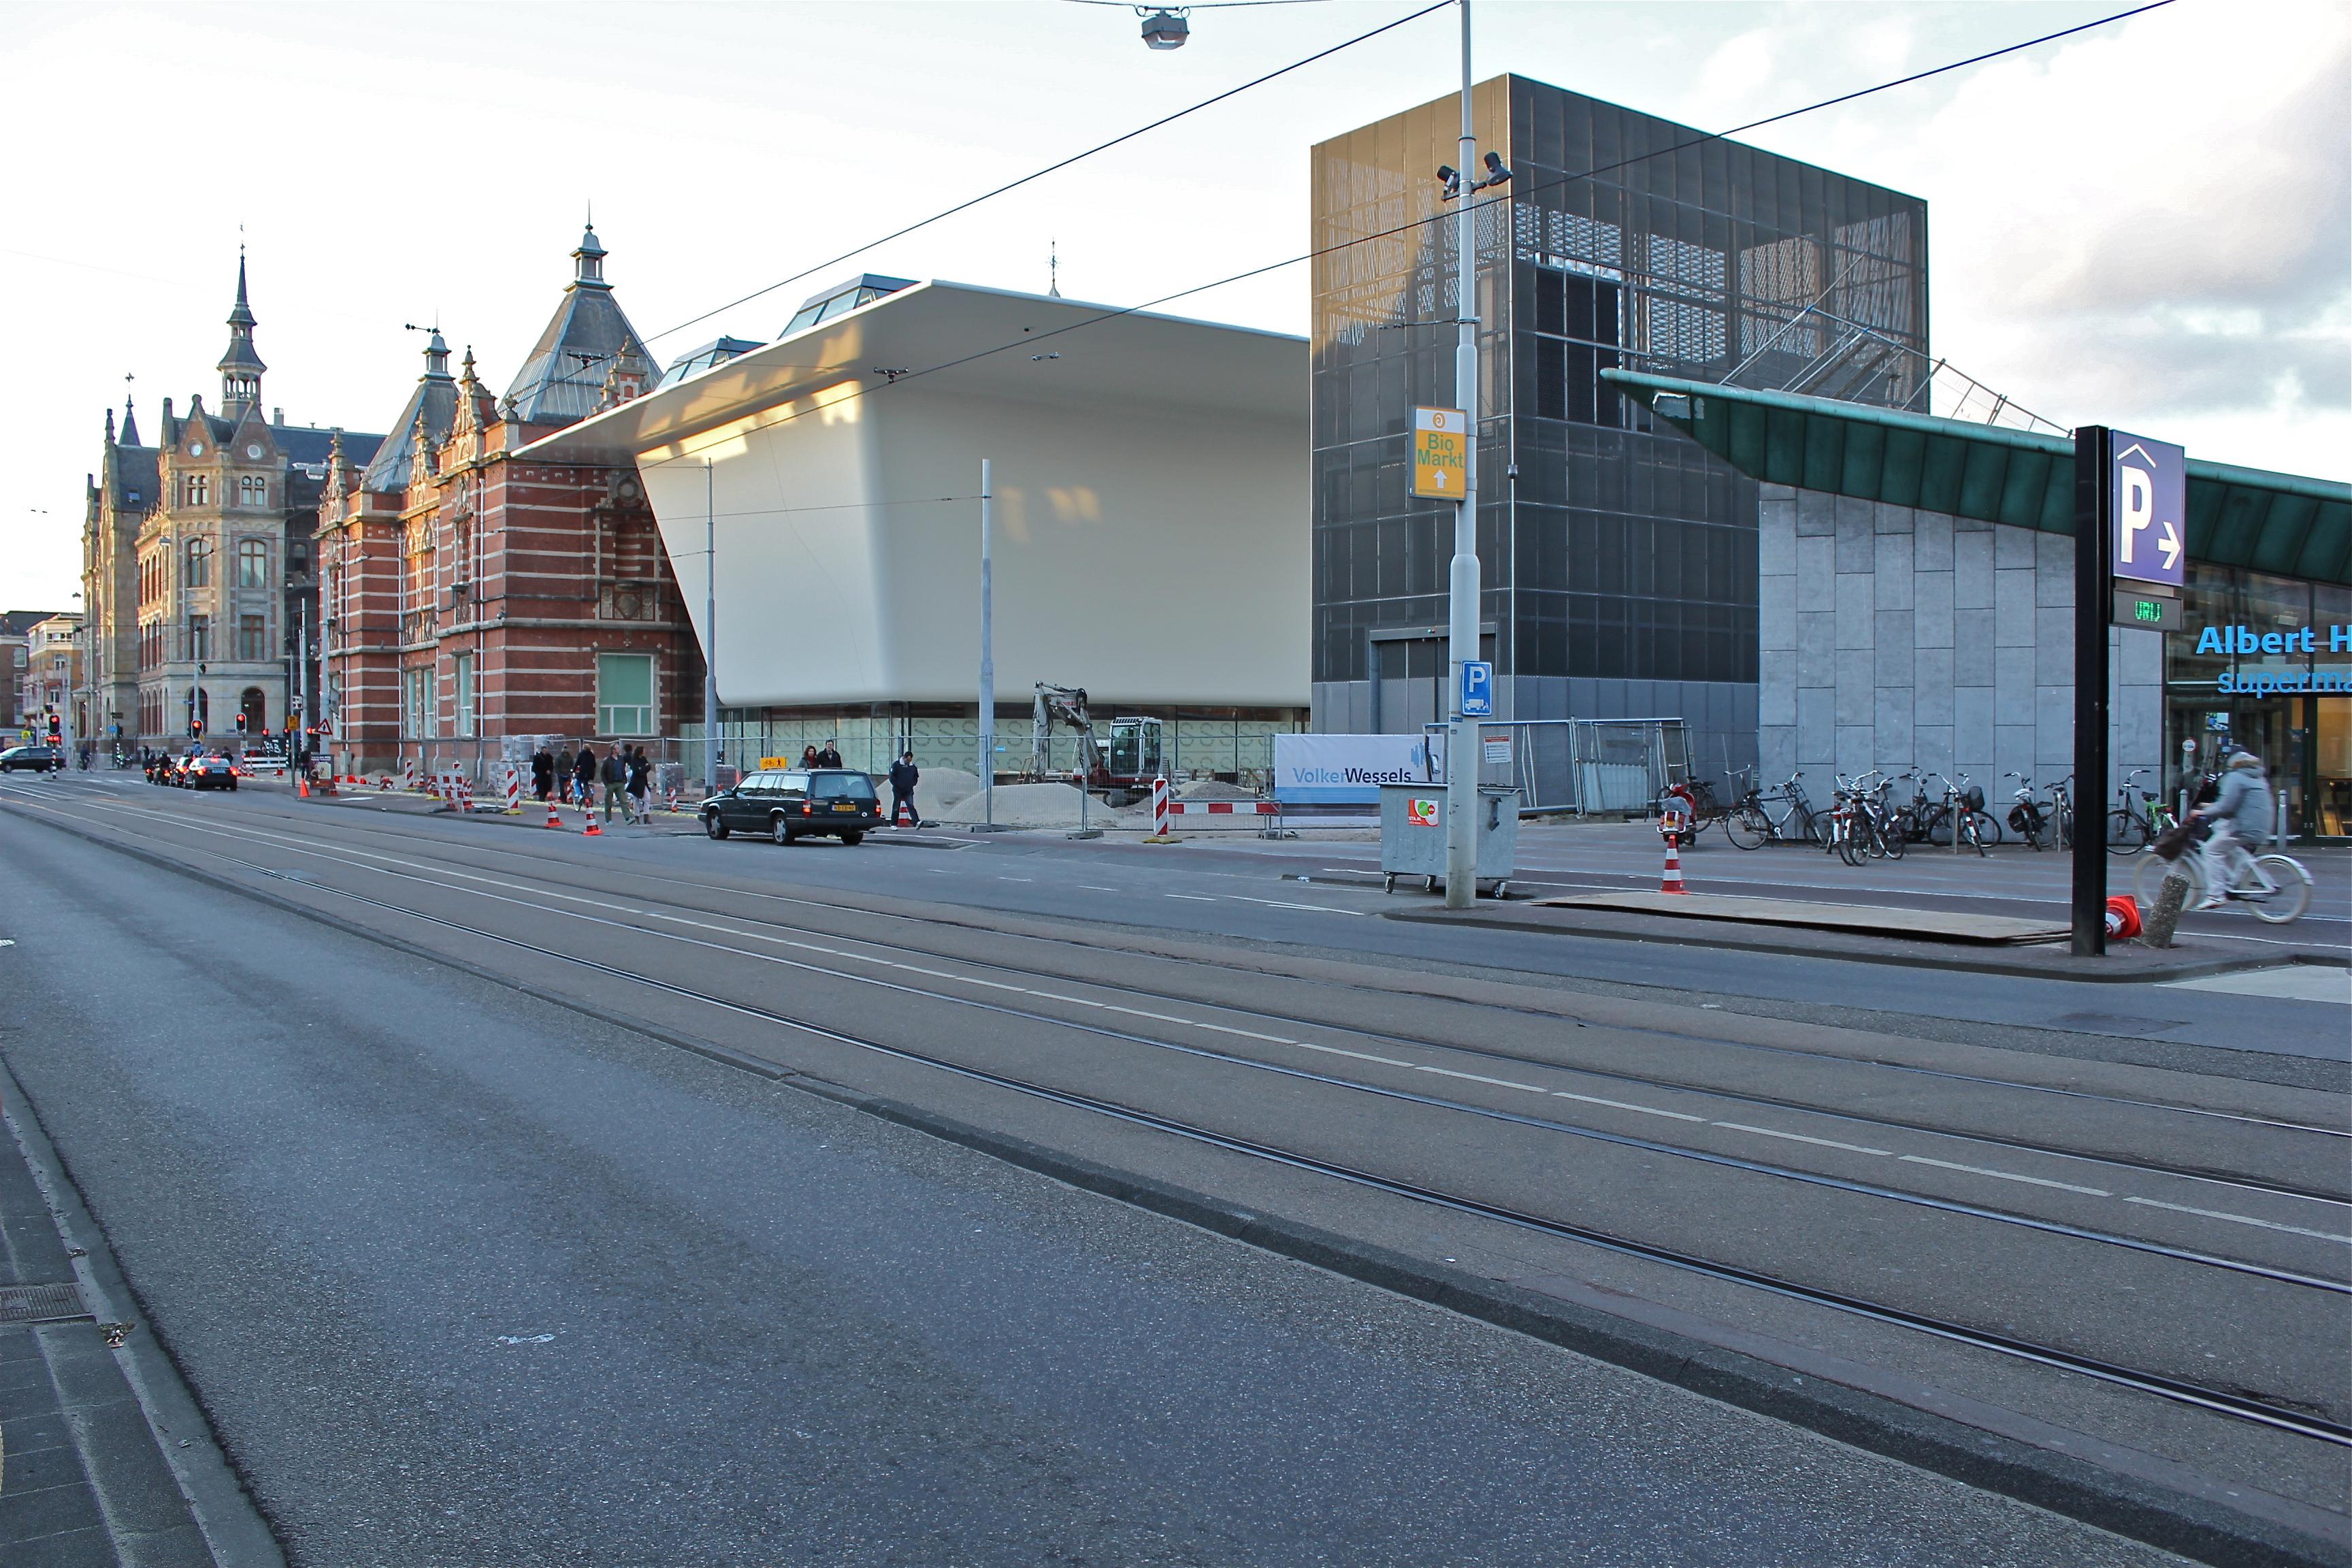 File:Stedelijk Museum Amsterdam.jpg - Wikimedia Commons